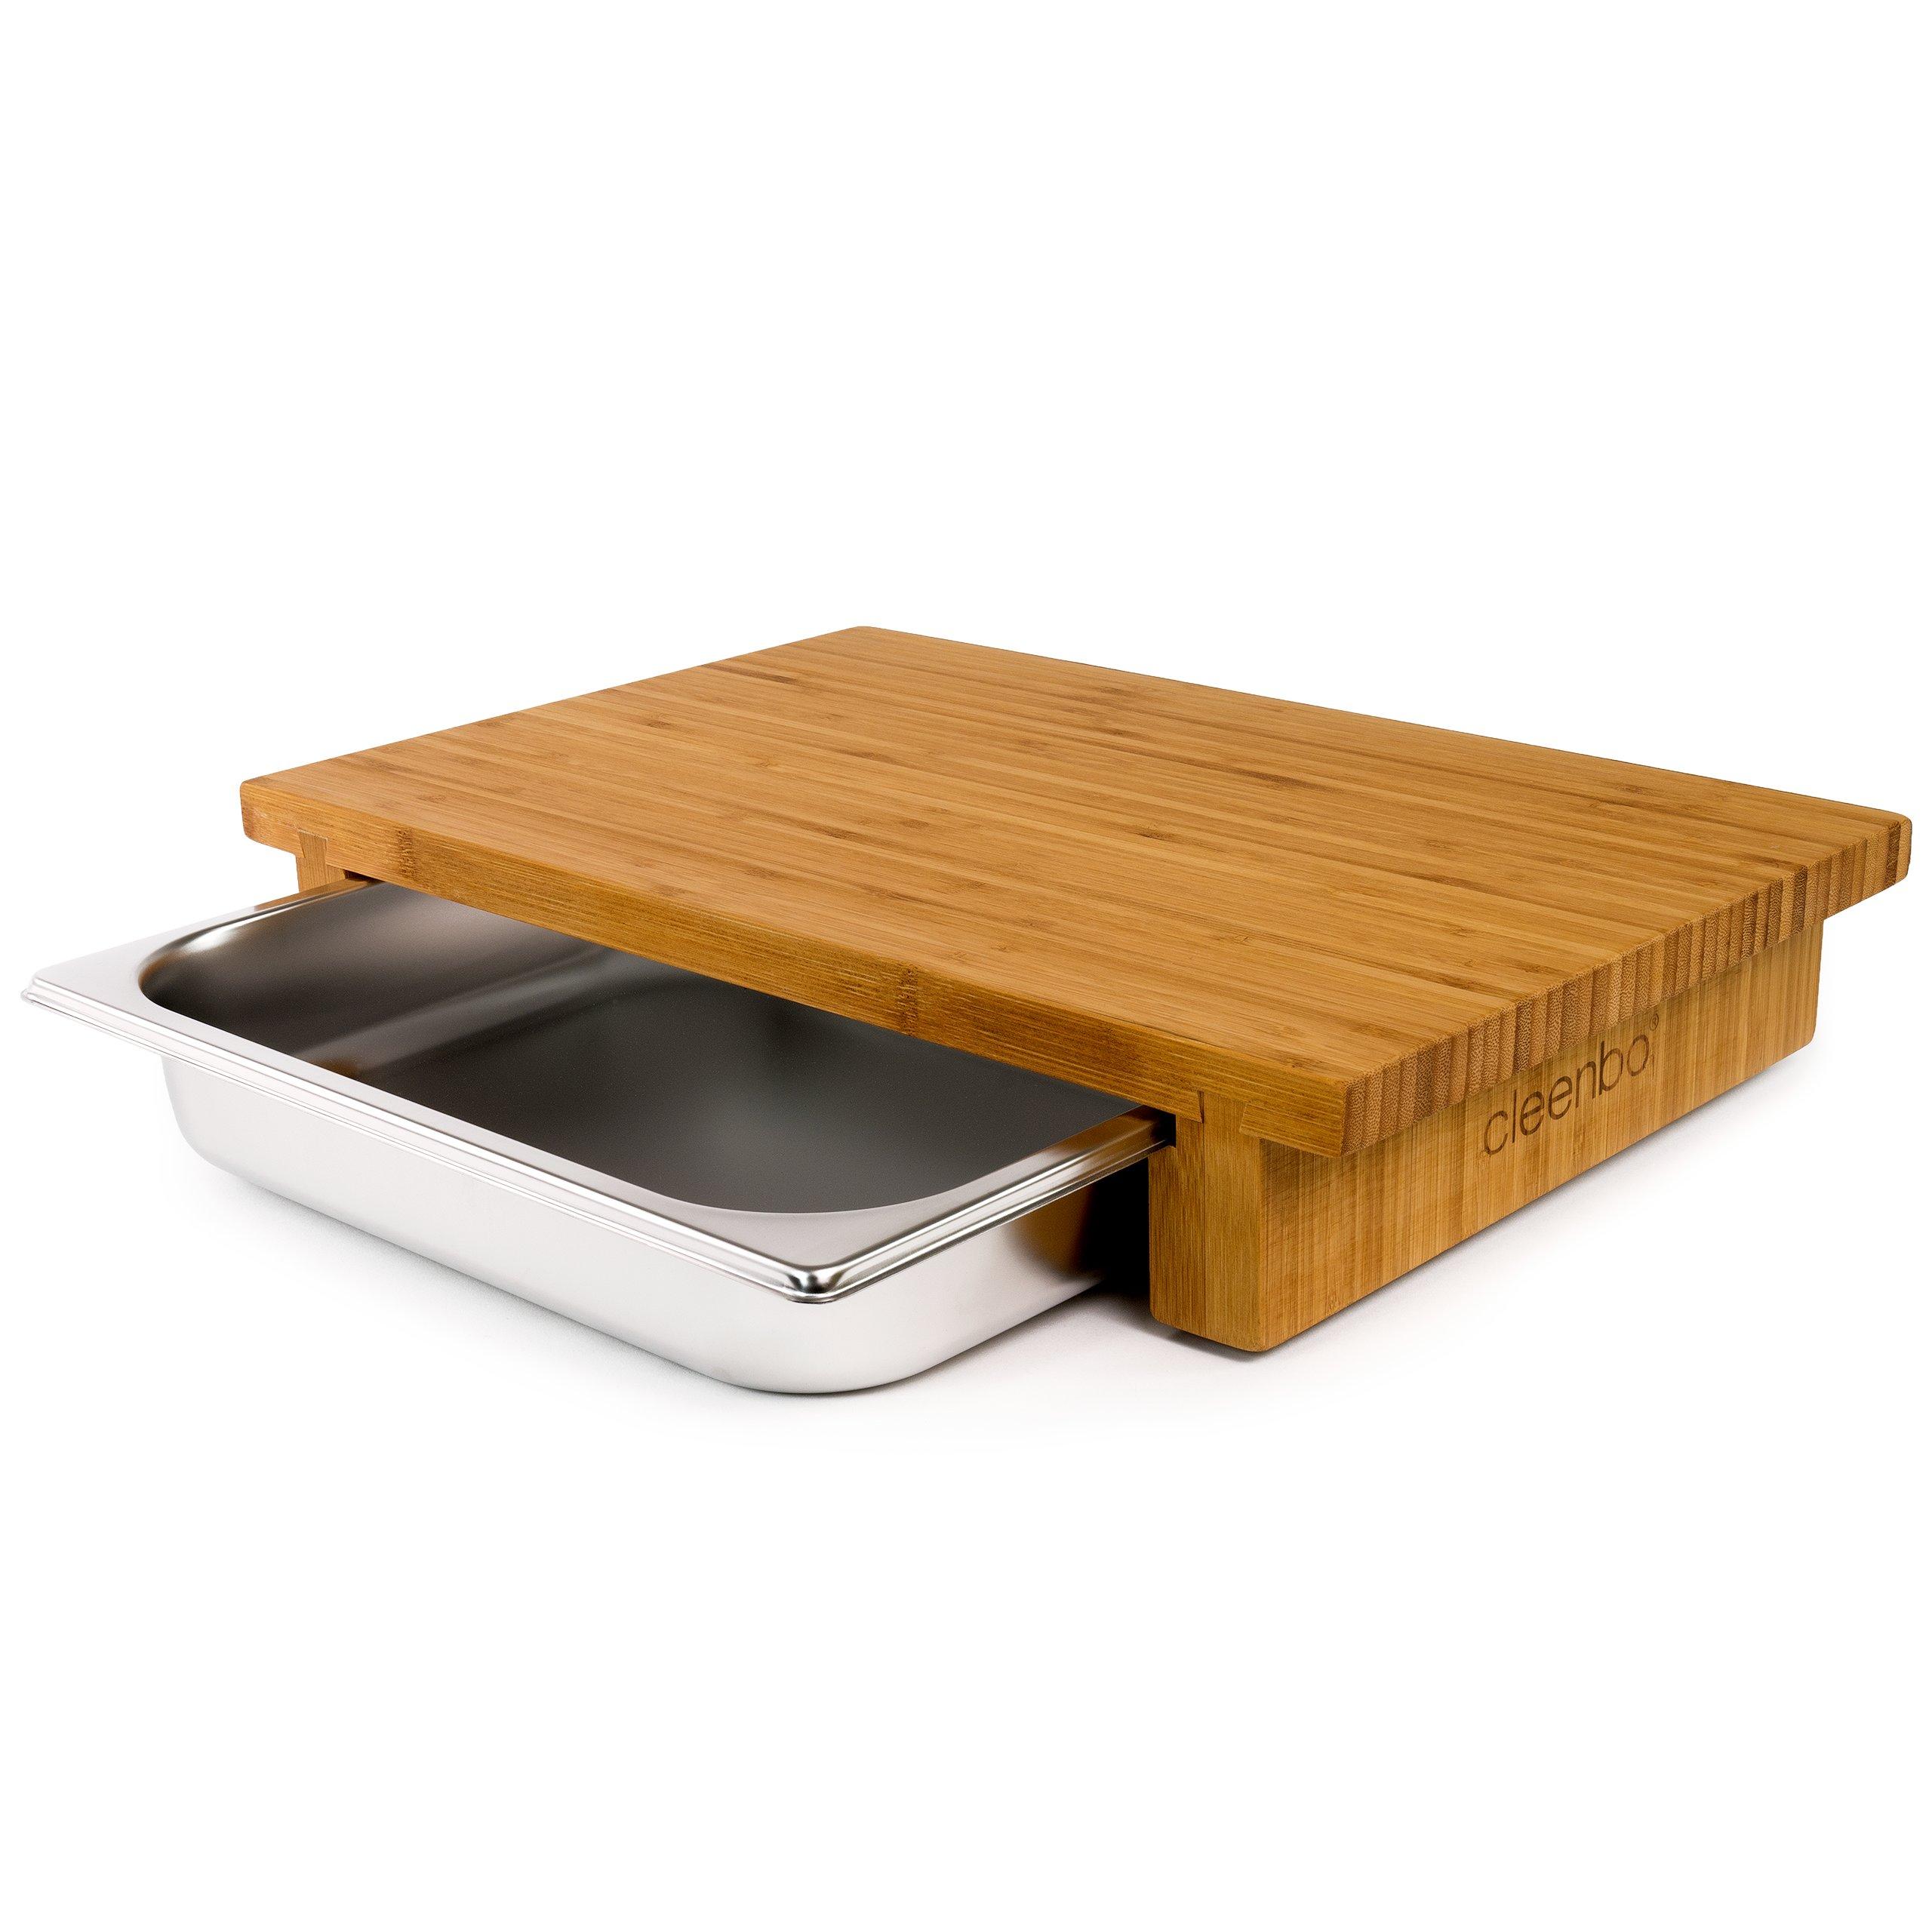 schneidebrett bambus mit edelstahlwanne 59 90. Black Bedroom Furniture Sets. Home Design Ideas